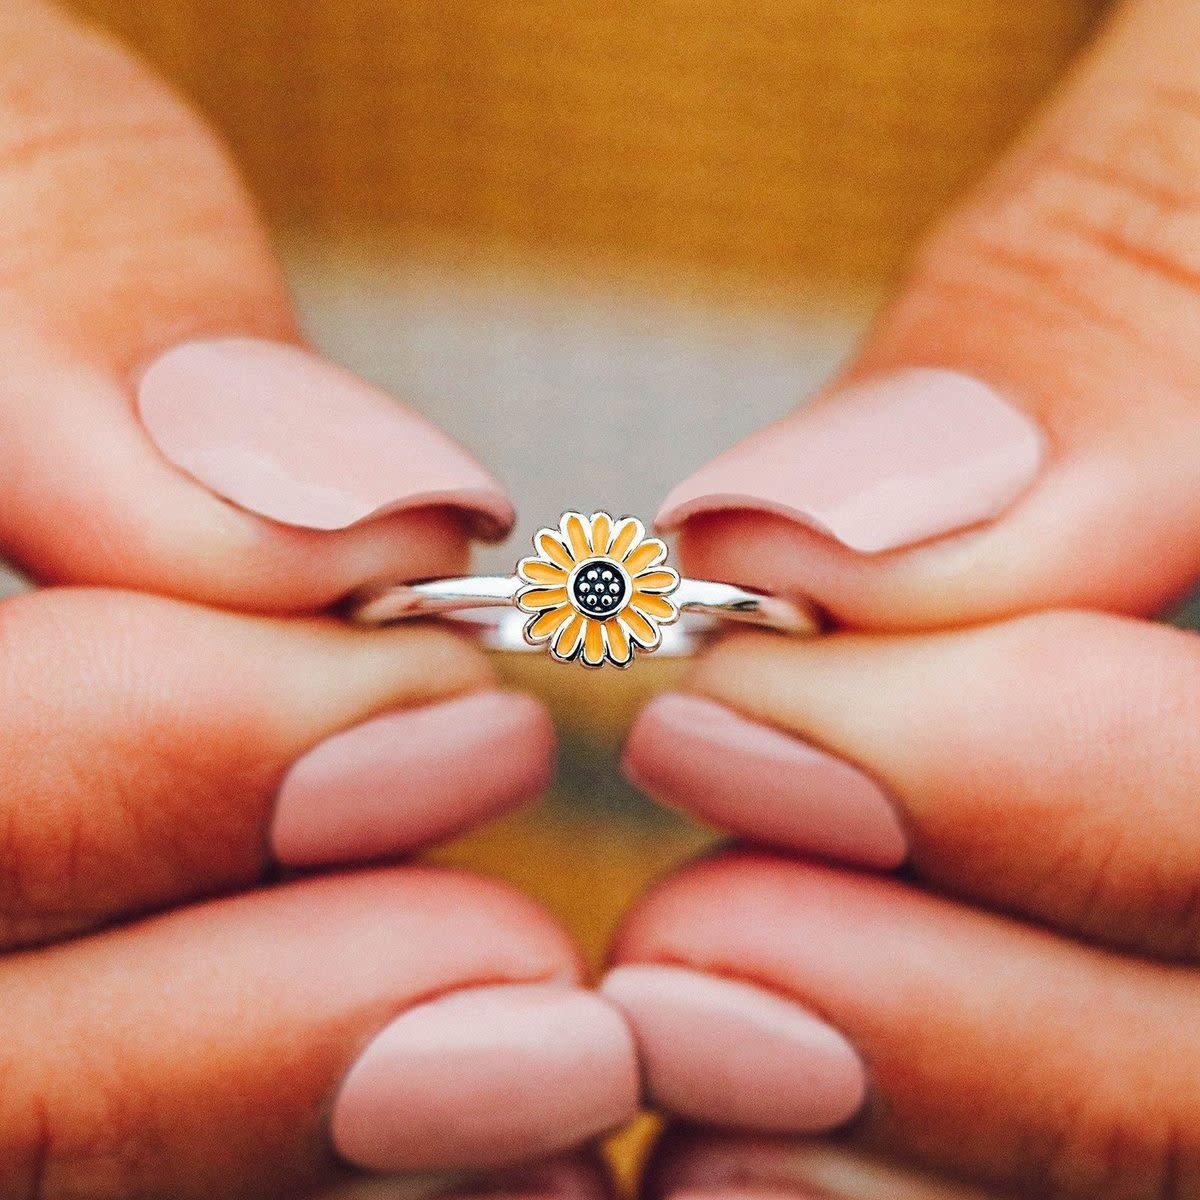 Pop Perfect Ring Diamontrigue Jewelry: Enamel Sunflower Ring